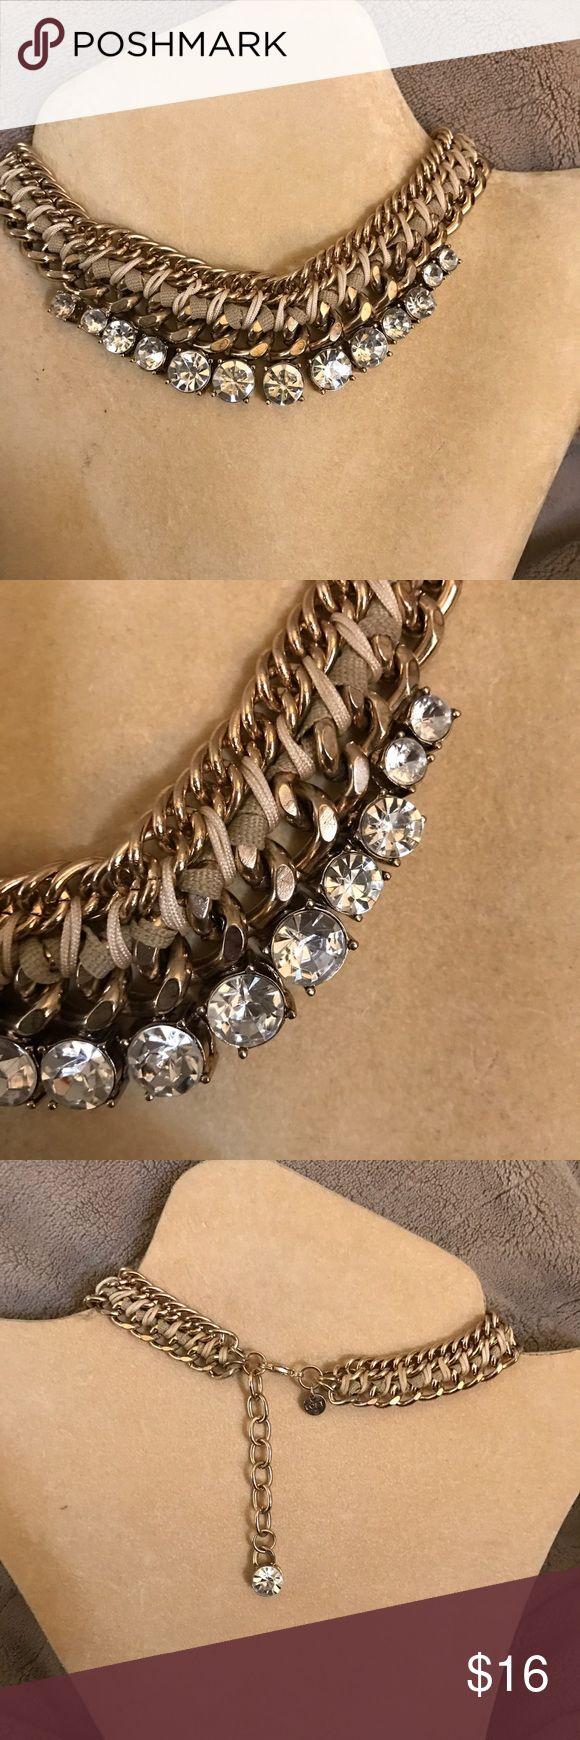 Loft chunky gold necklace Beautiful Loft chunky gold necklace LOFT Jewelry Necklaces